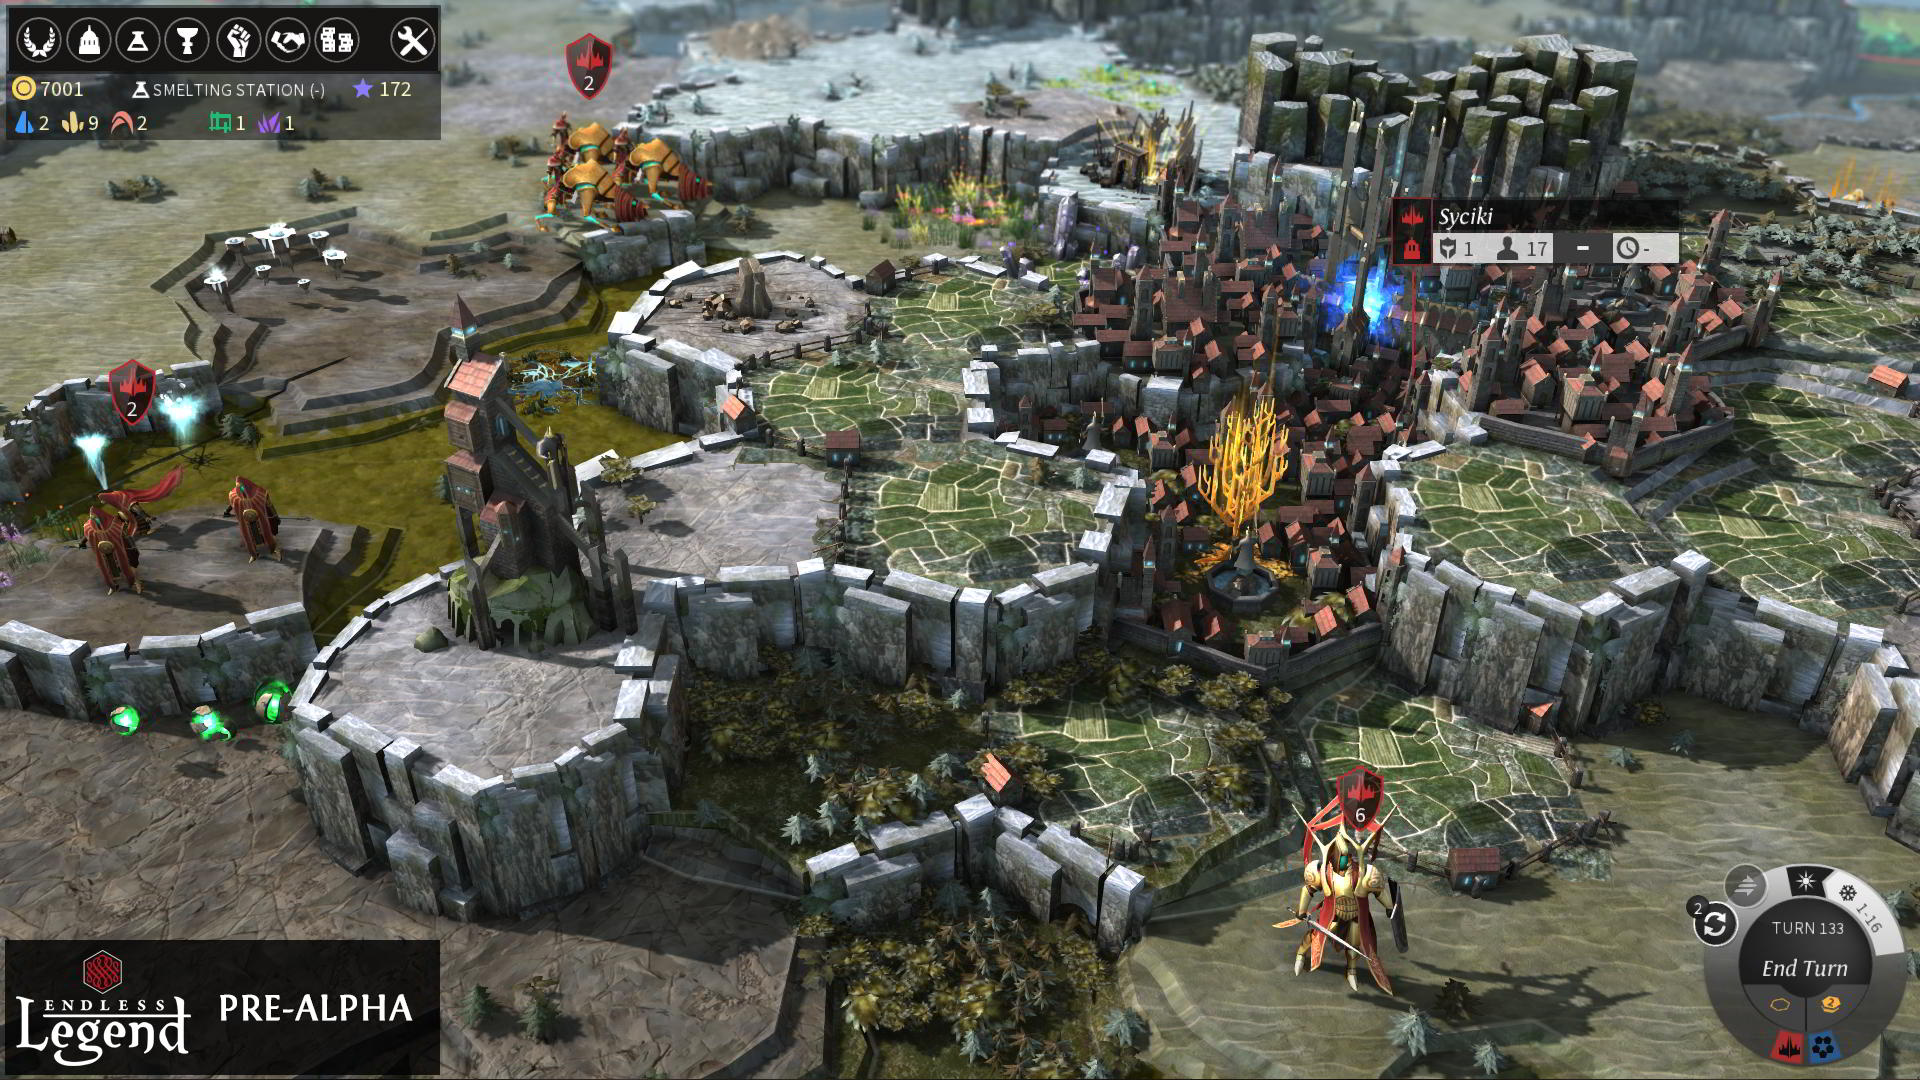 endless legend - broken lords fortress